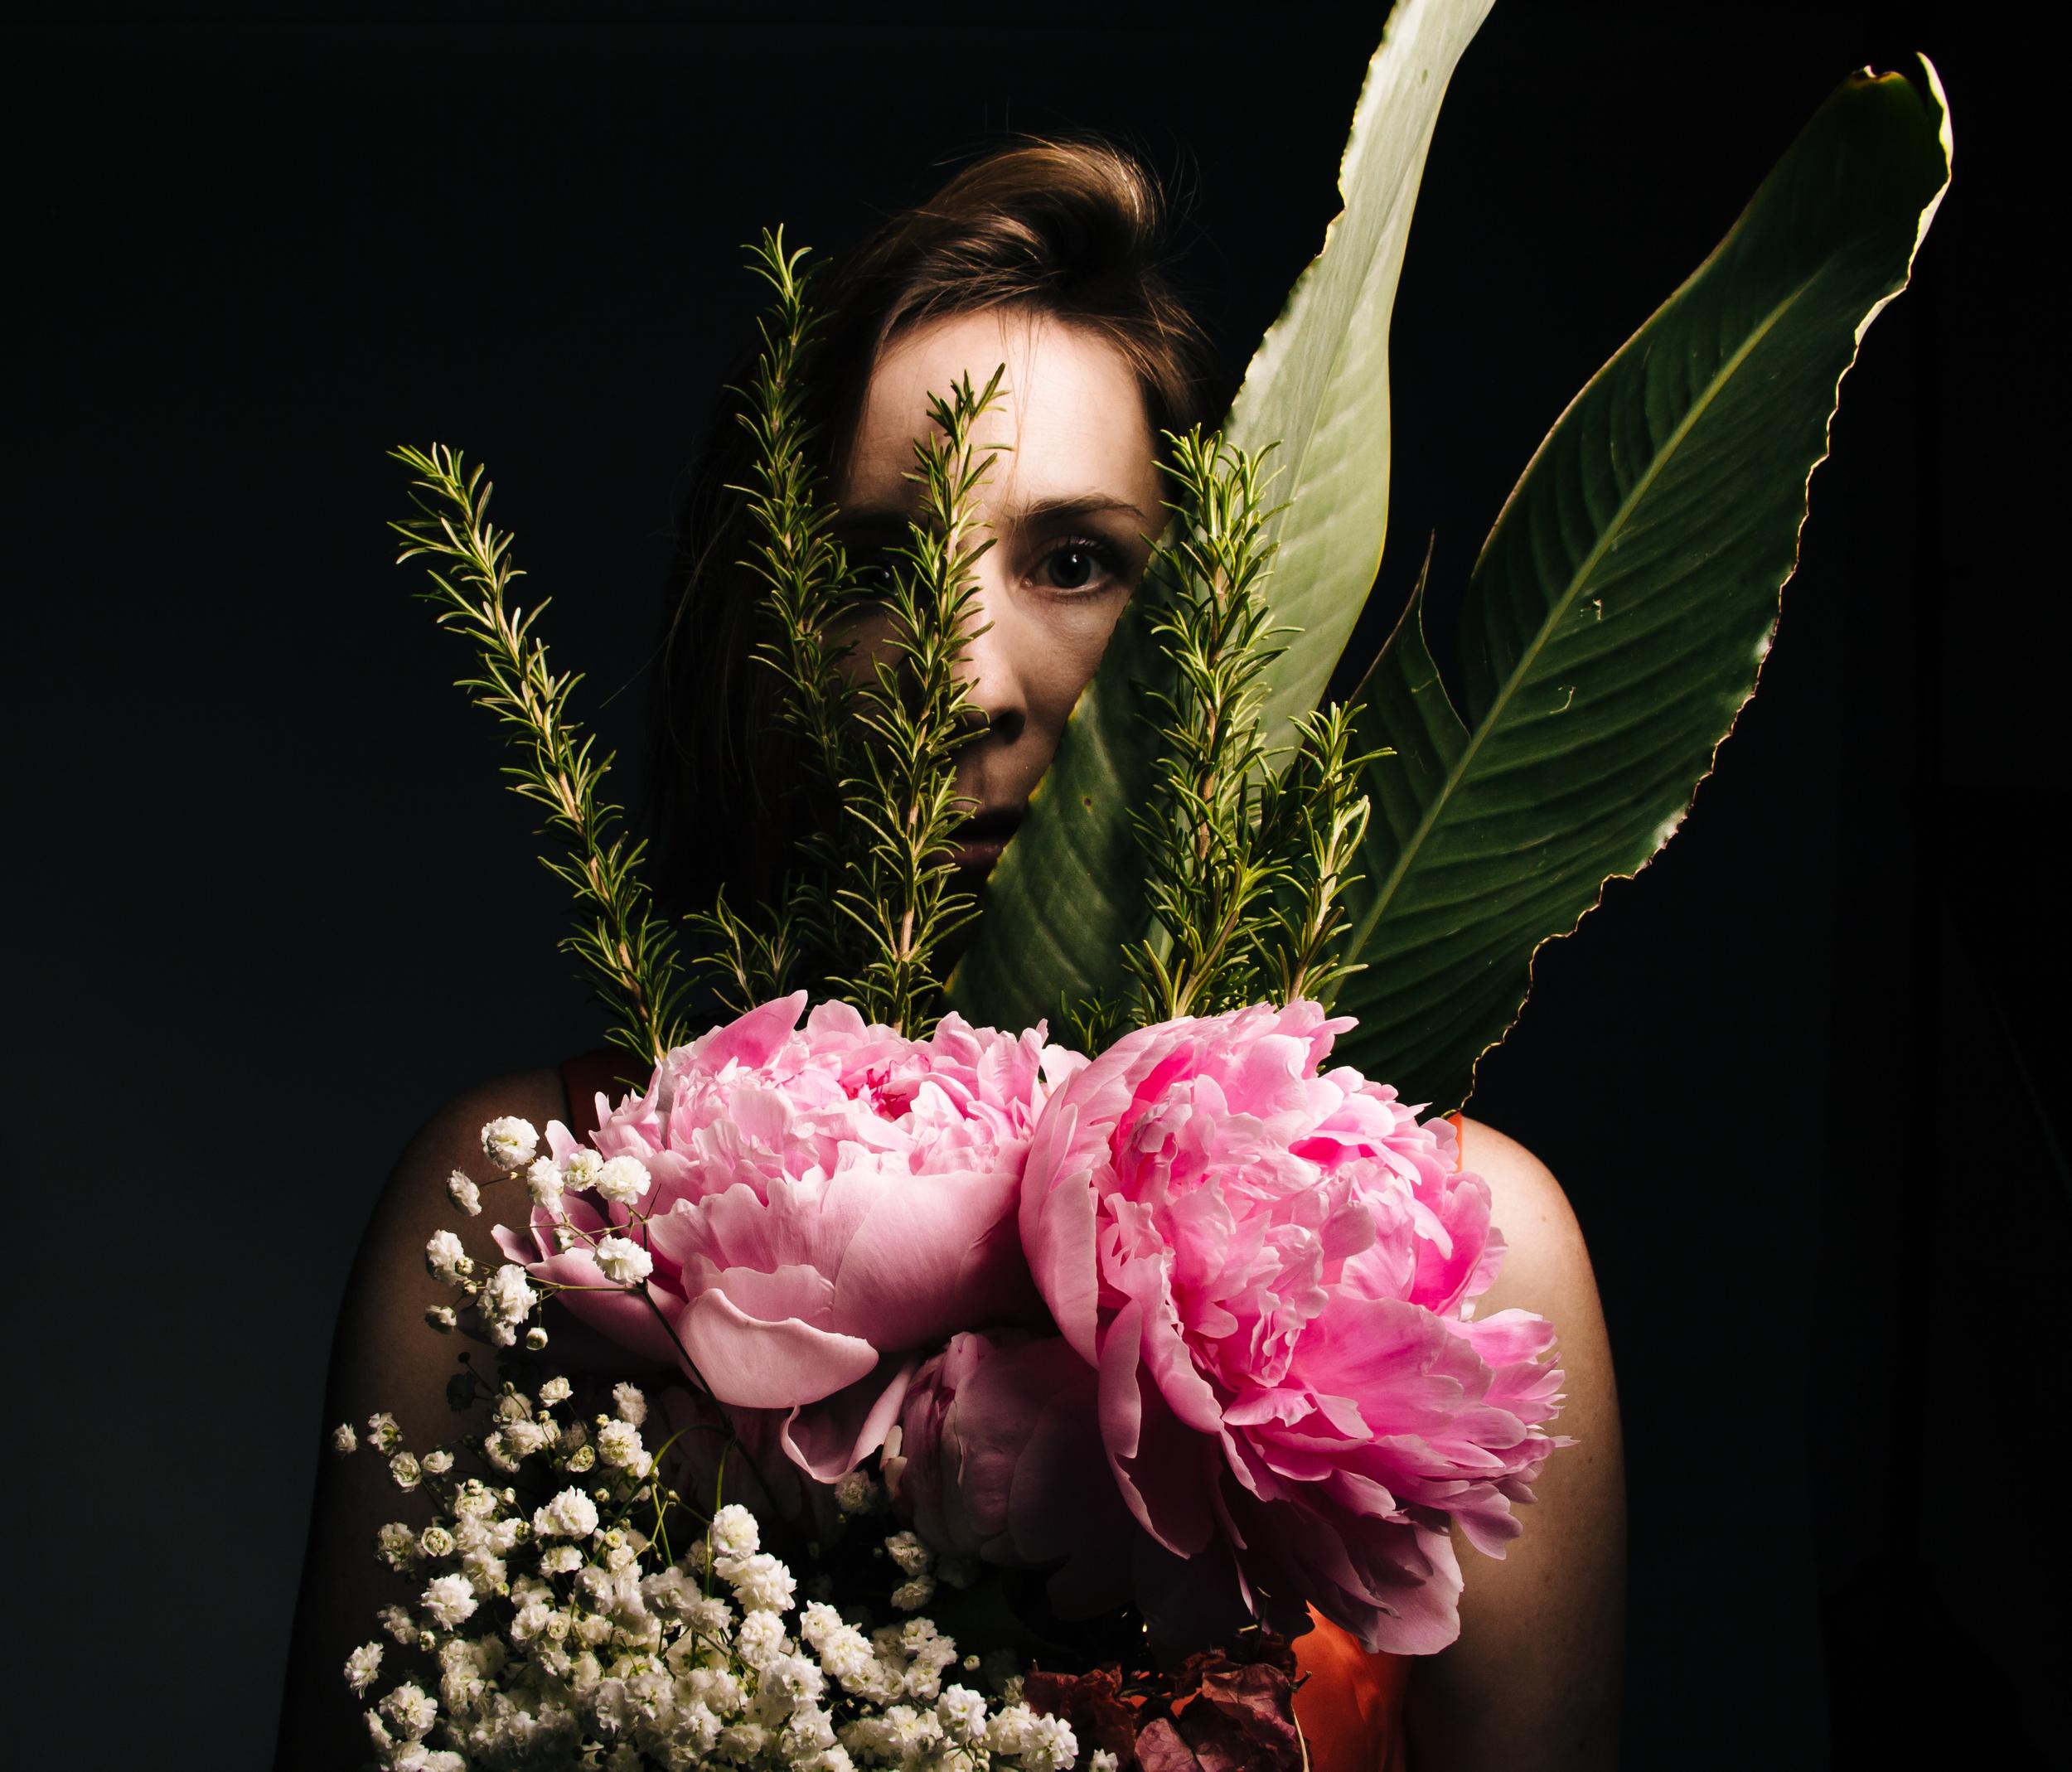 Marissa Berrini, Creative Director and Photographer